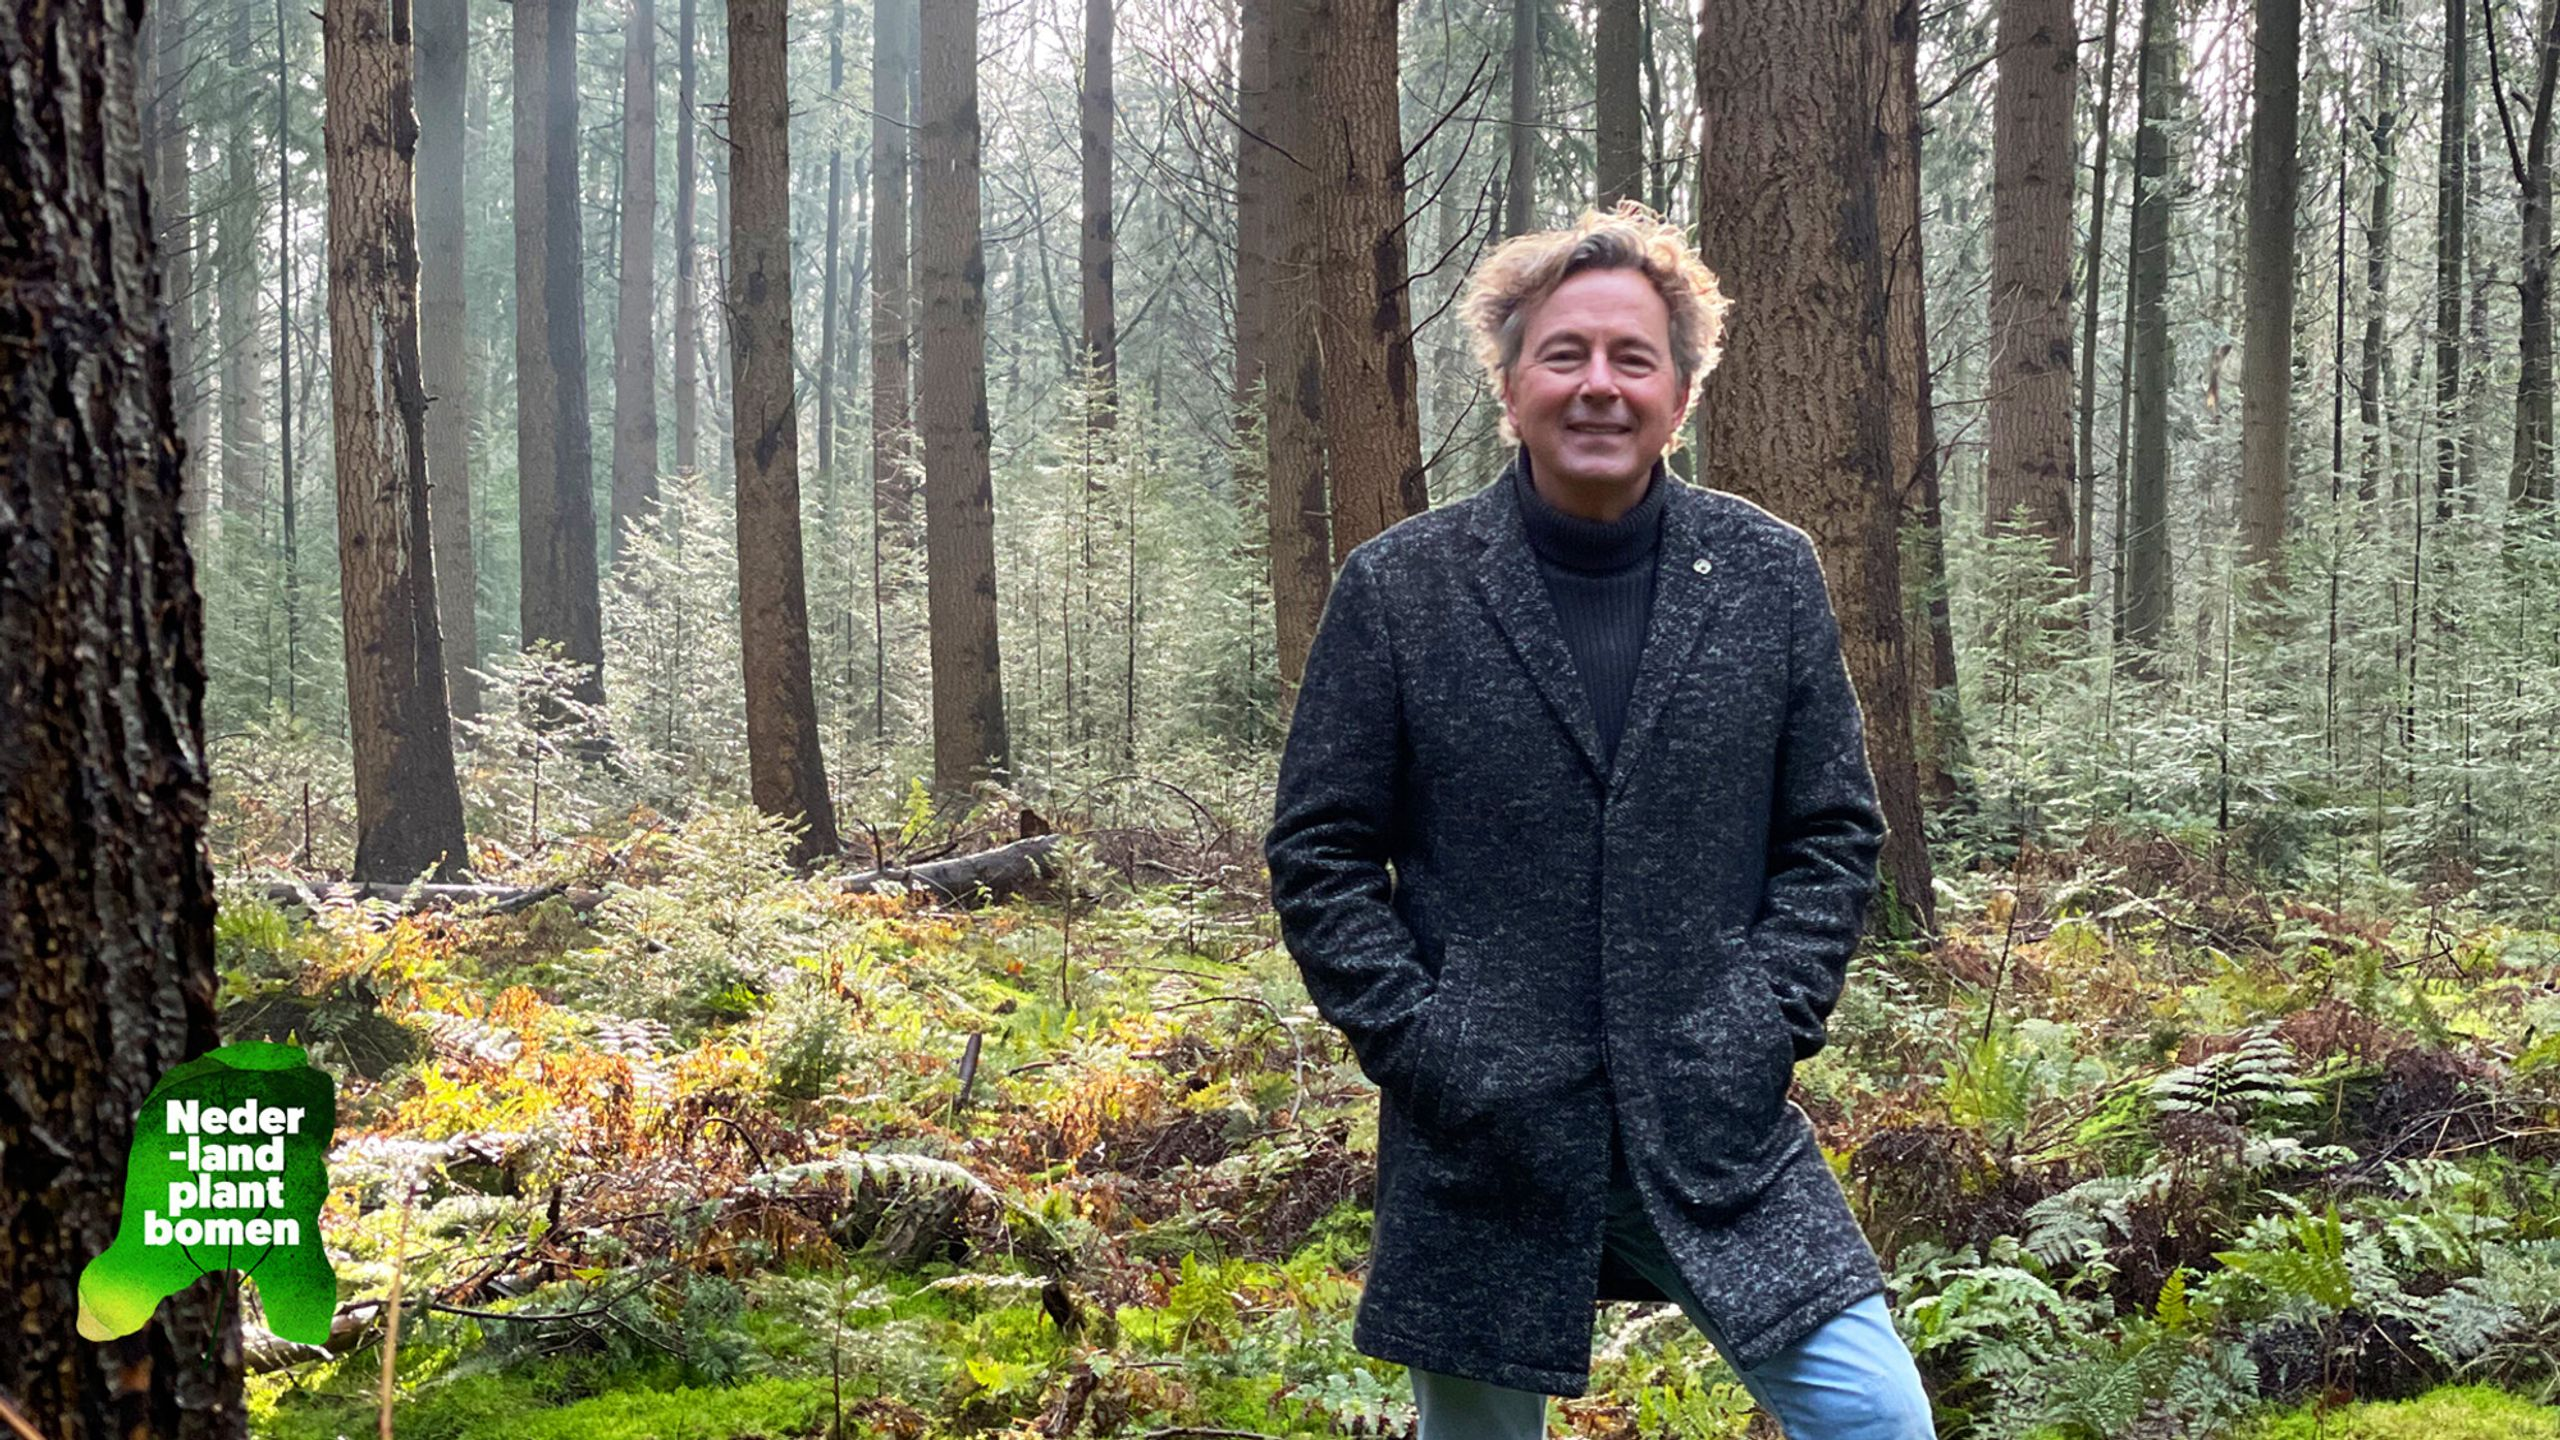 Nederland plant bomen